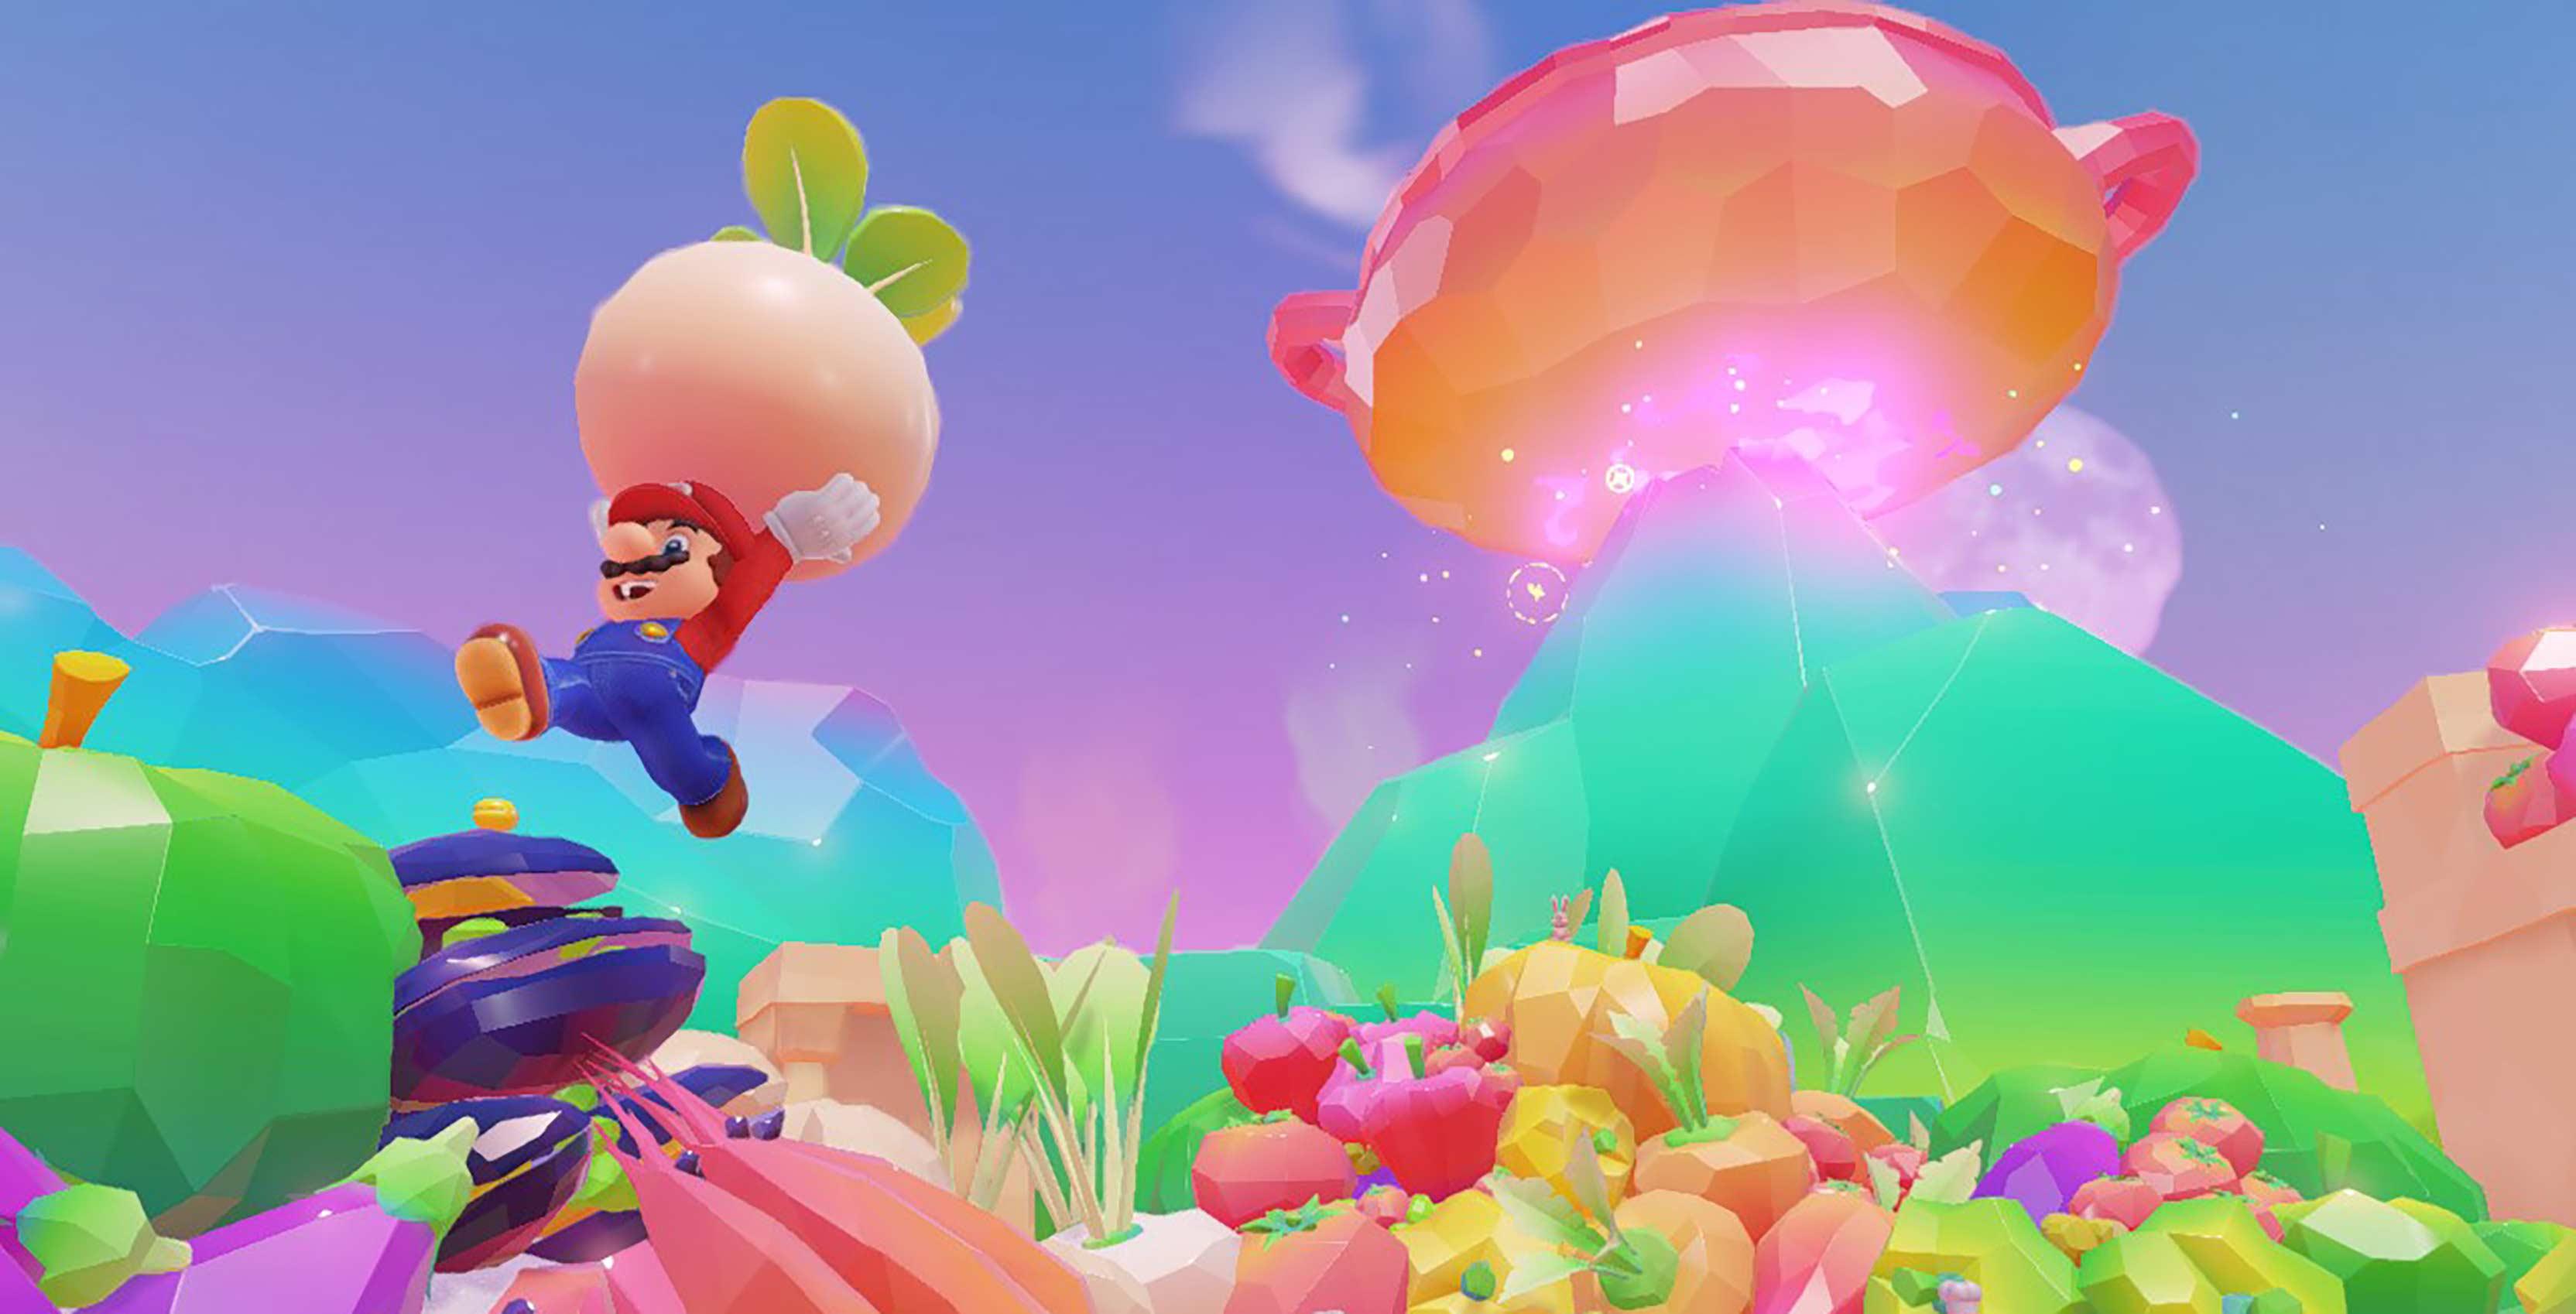 Super Mario Odyssey Mario jumping